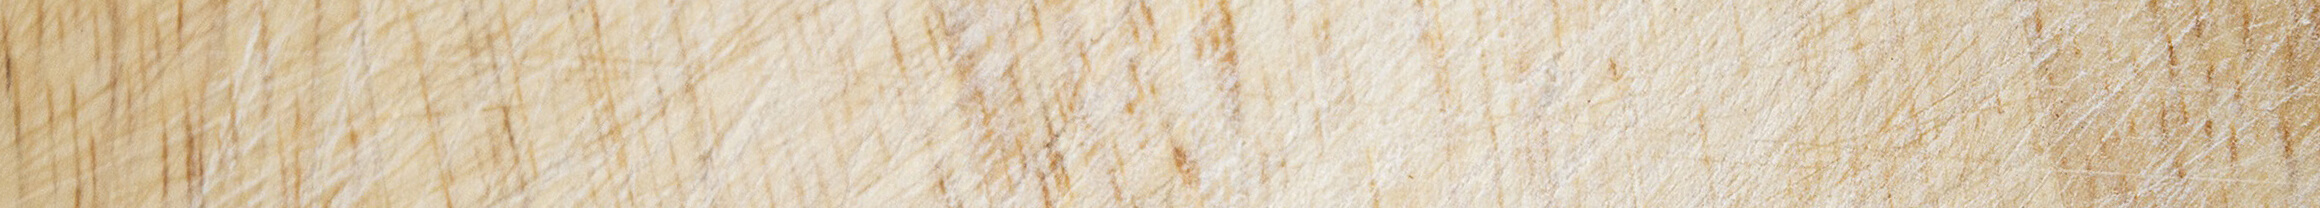 Woodgrain 01